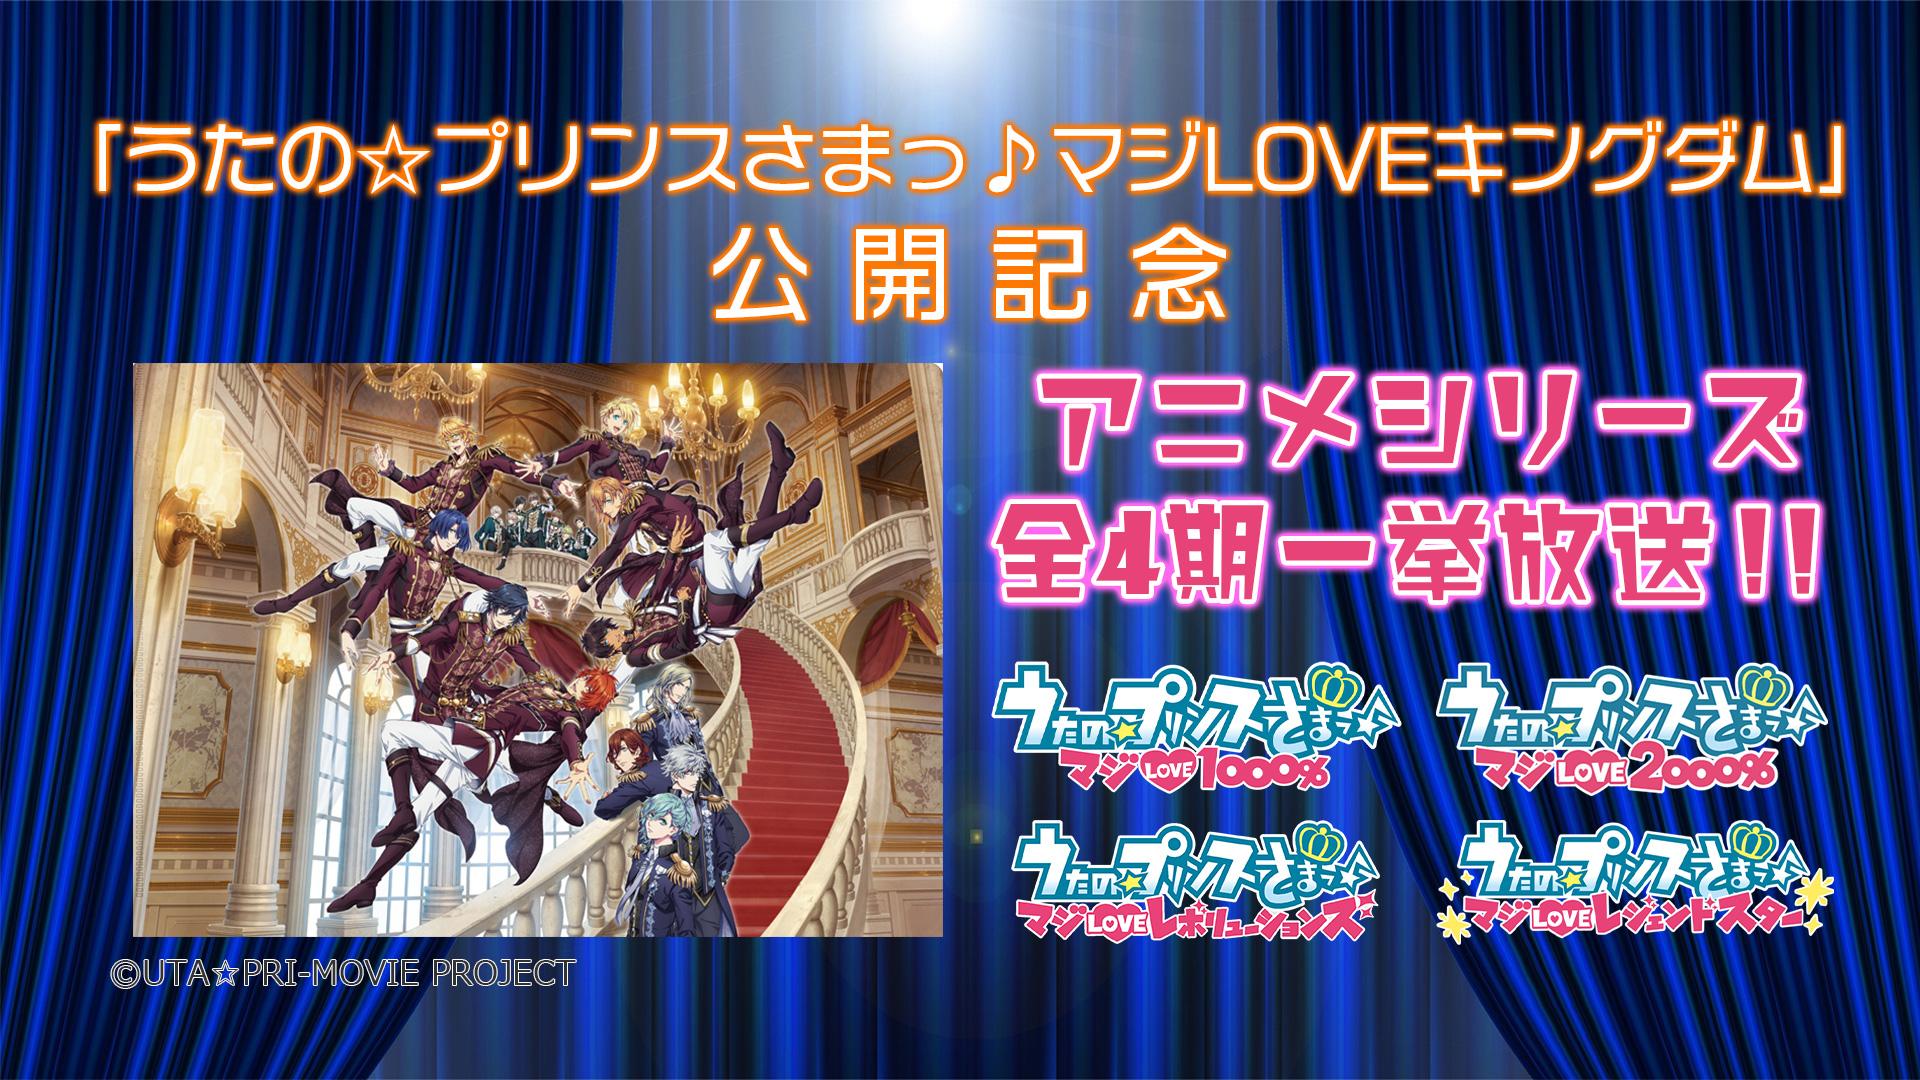 TVアニメ「うたの☆プリンスさまっ♪ マジLOVE」シリーズ 全4期一挙放送!!